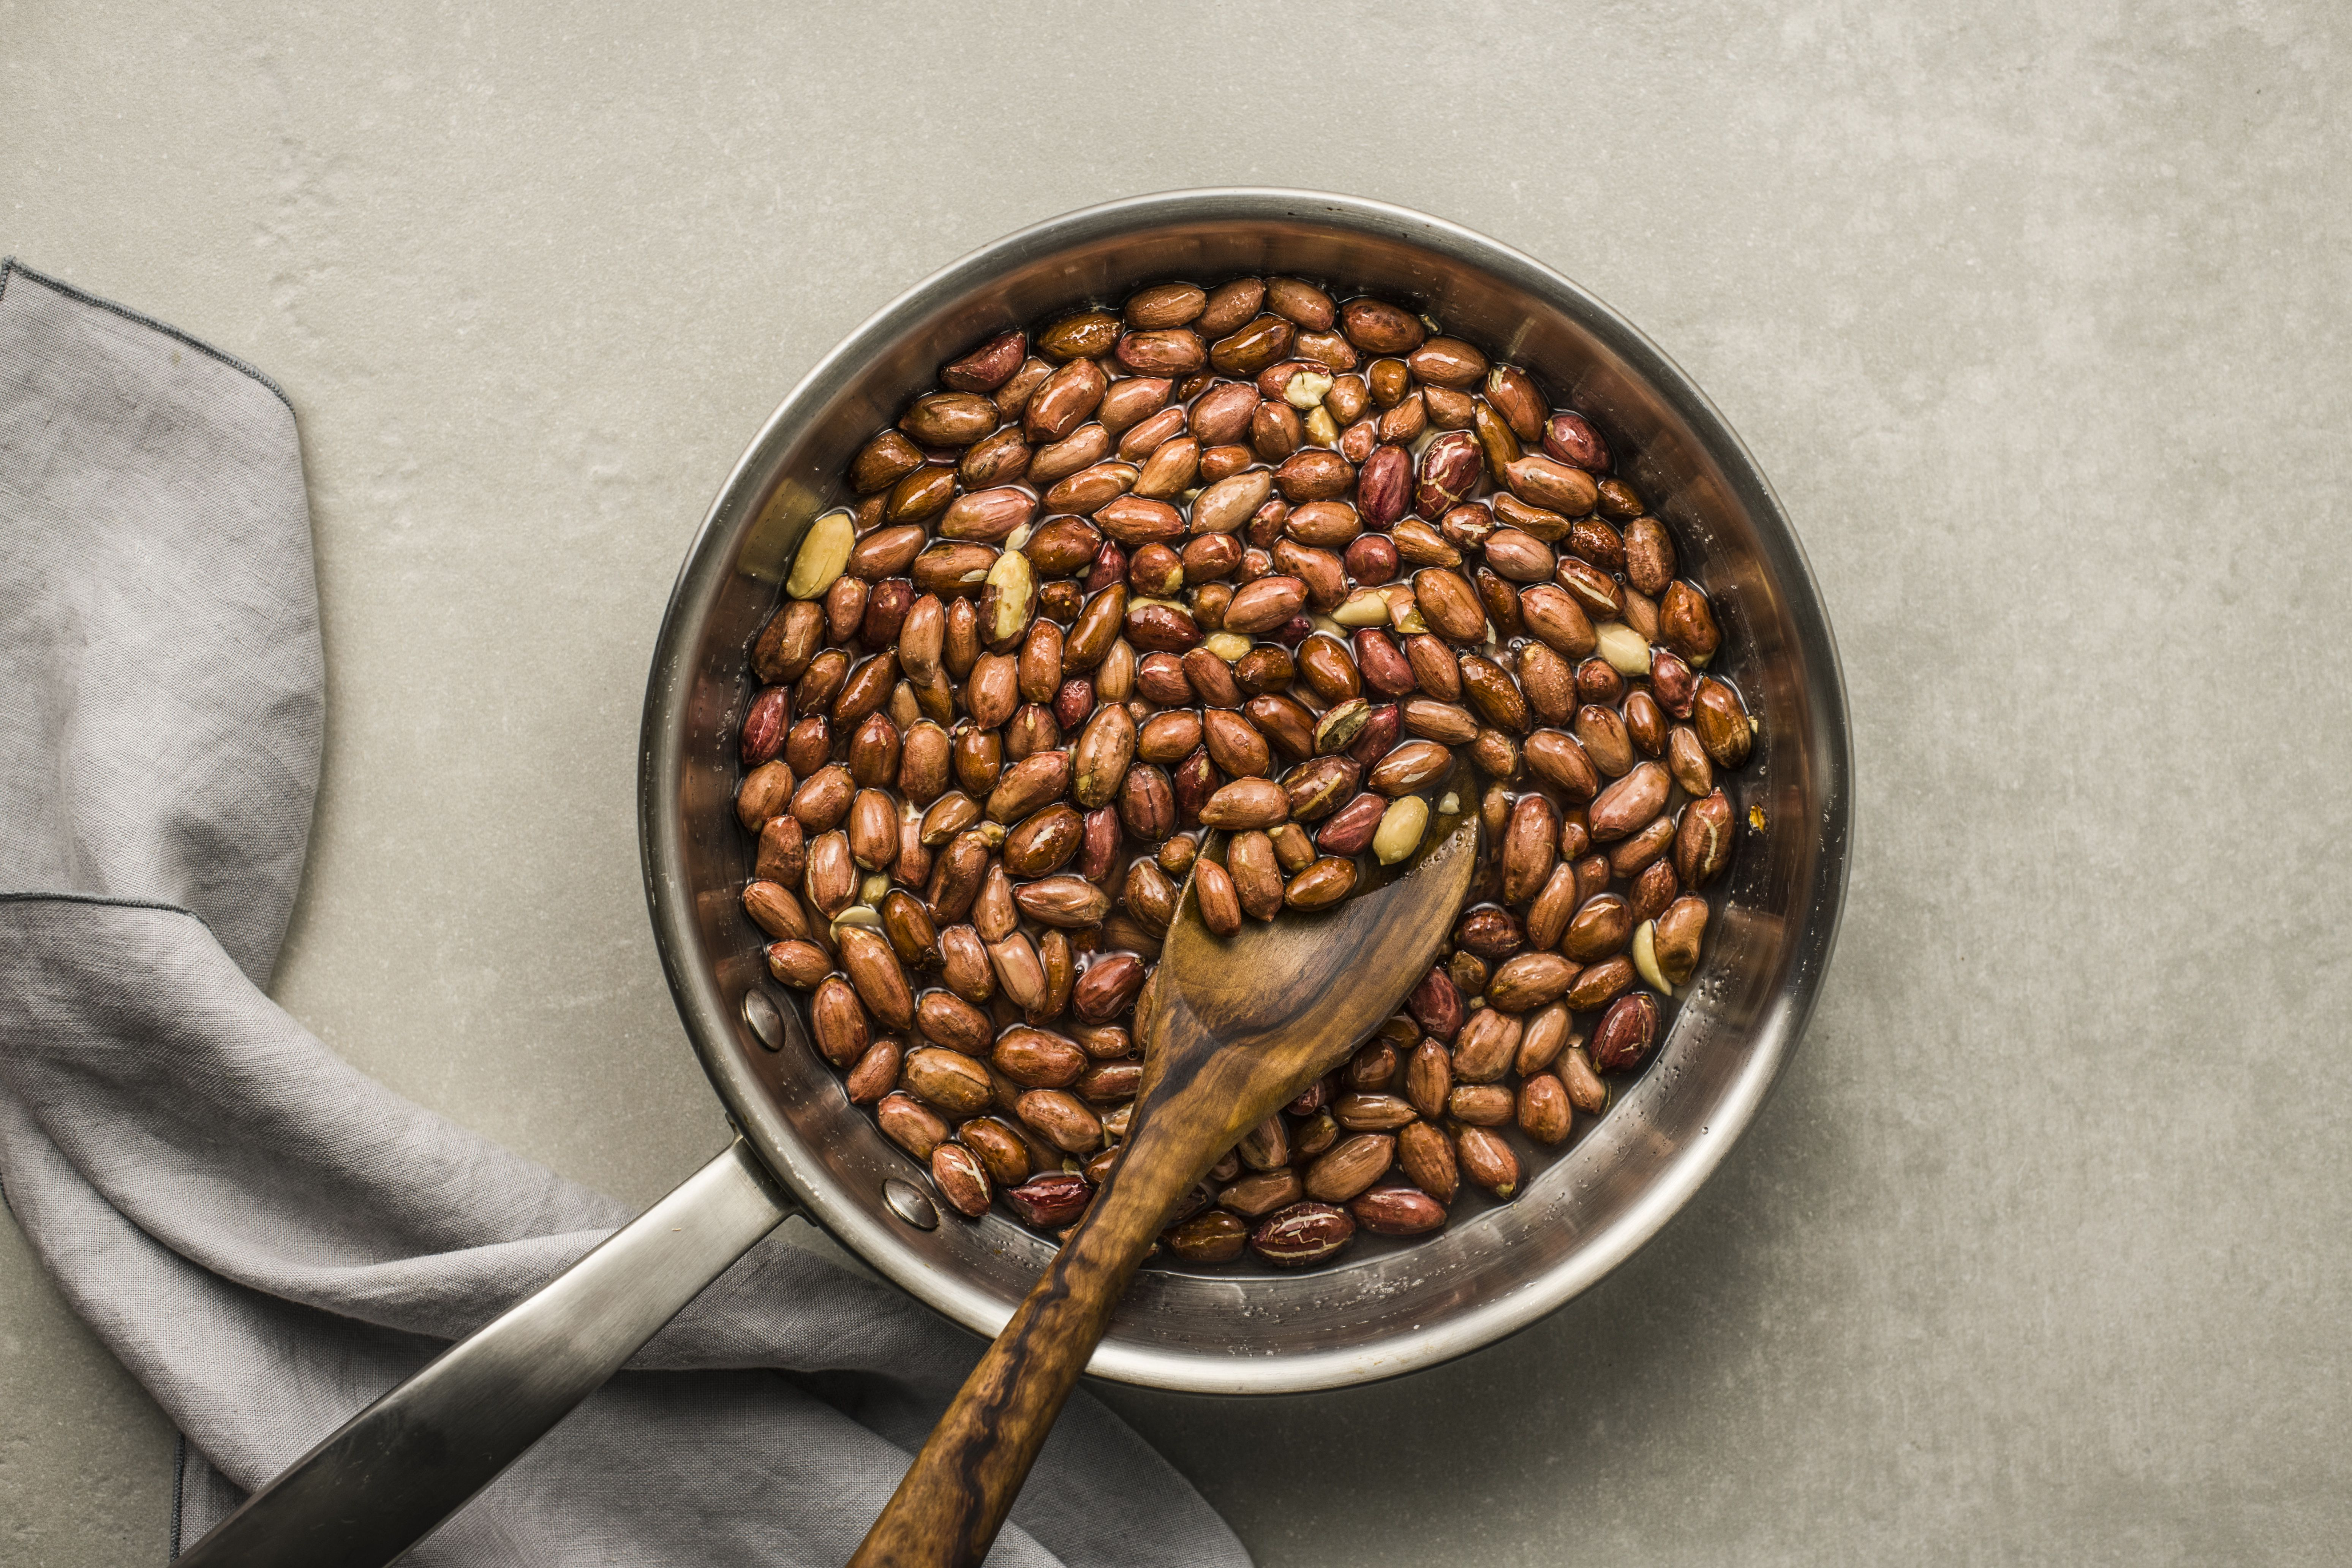 Combine peanut, sugar, and water